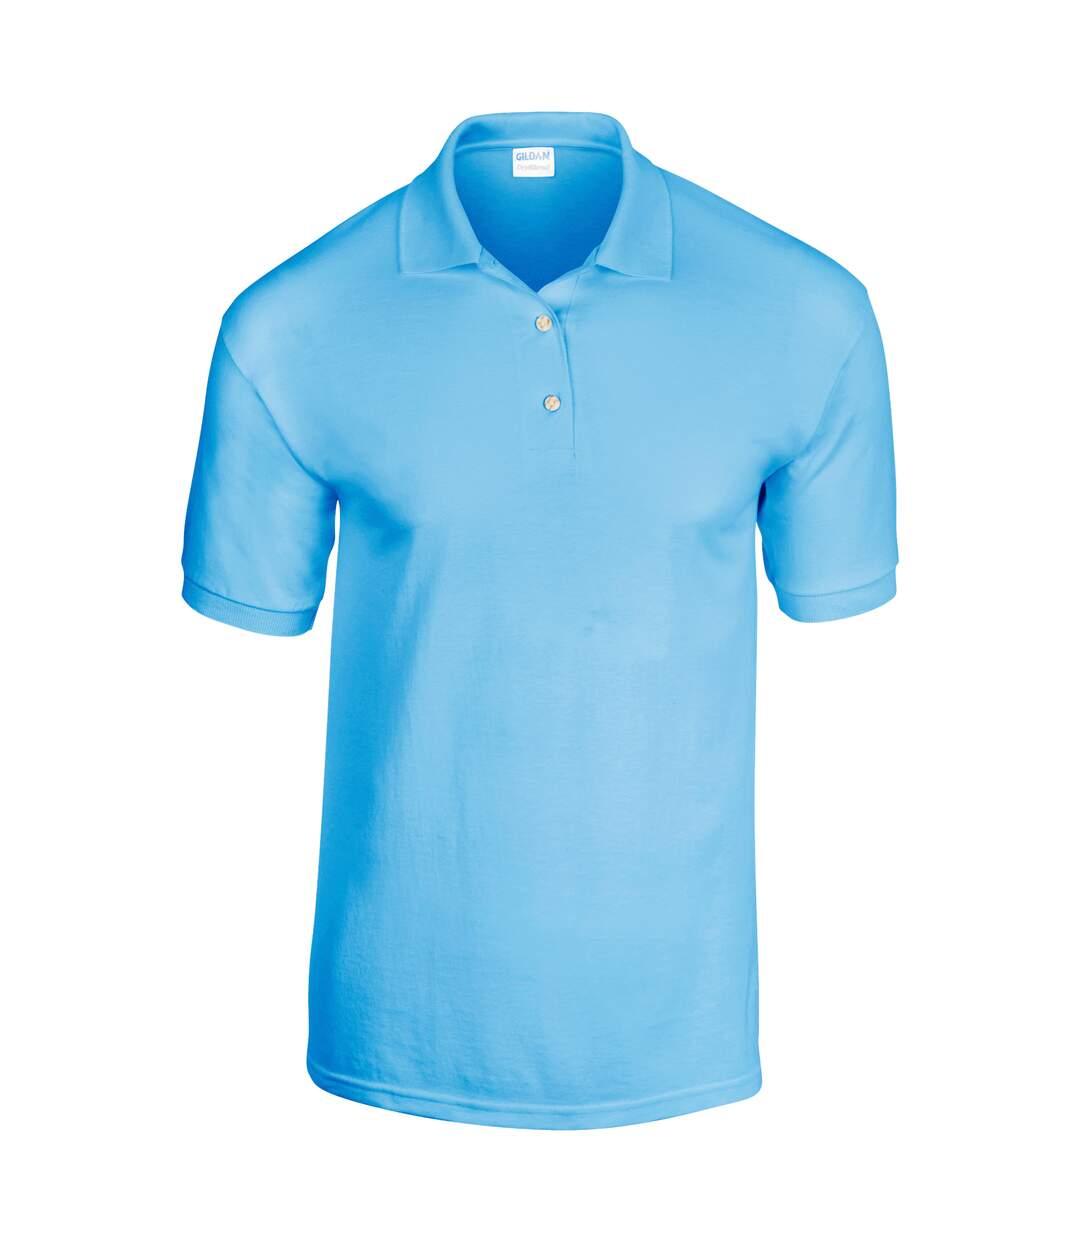 Gildan Adult DryBlend Jersey Short Sleeve Polo Shirt (Navy) - UTBC496